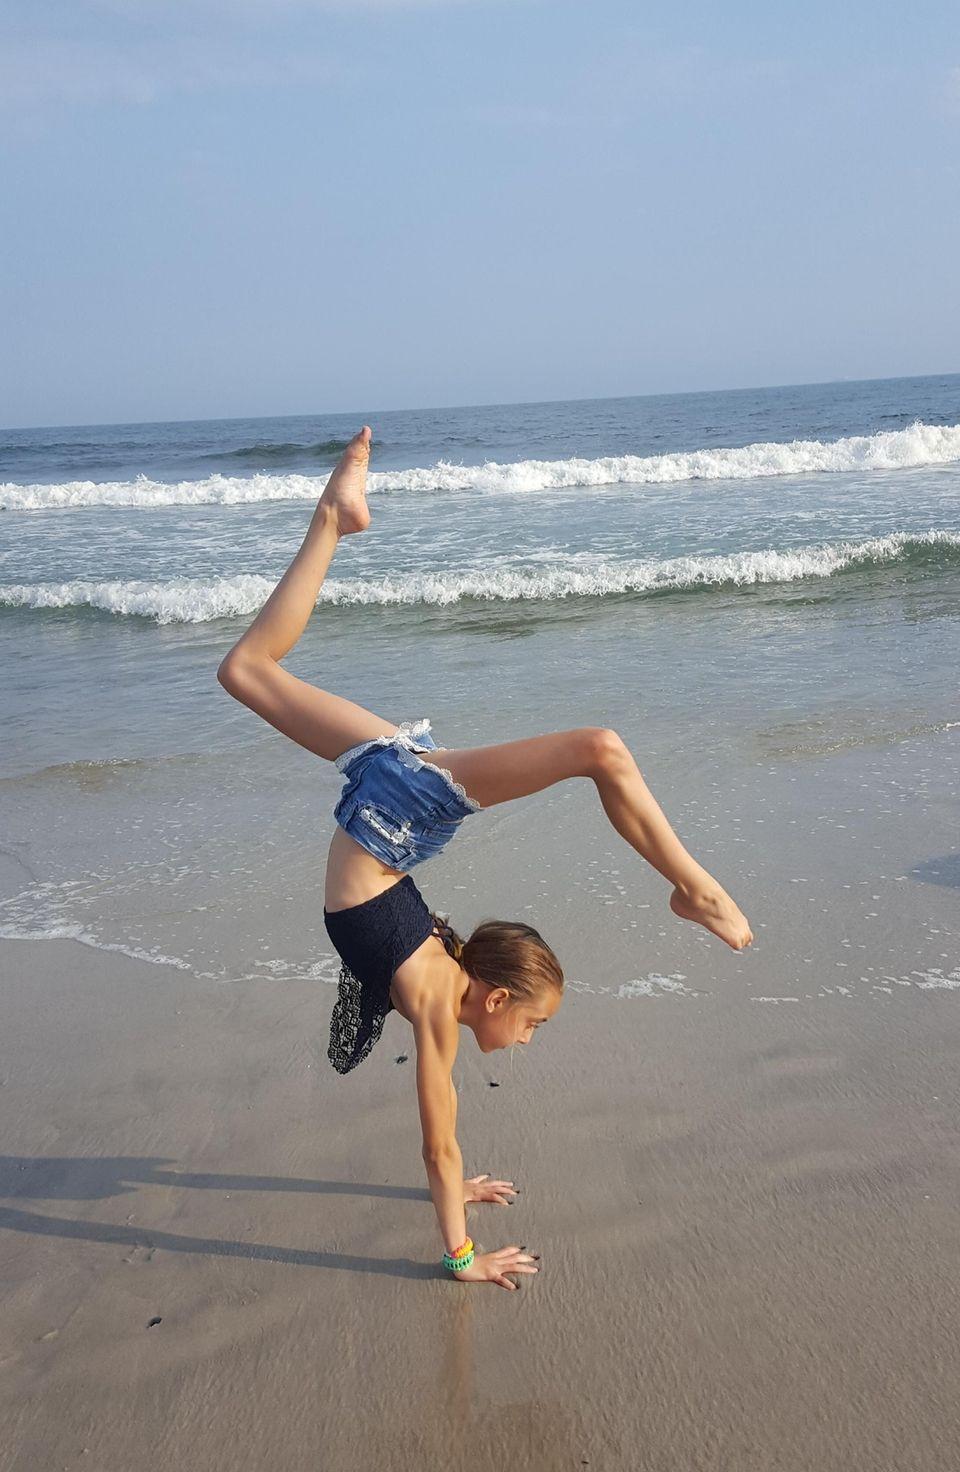 Sophia's handstand on the beach at Long Beach